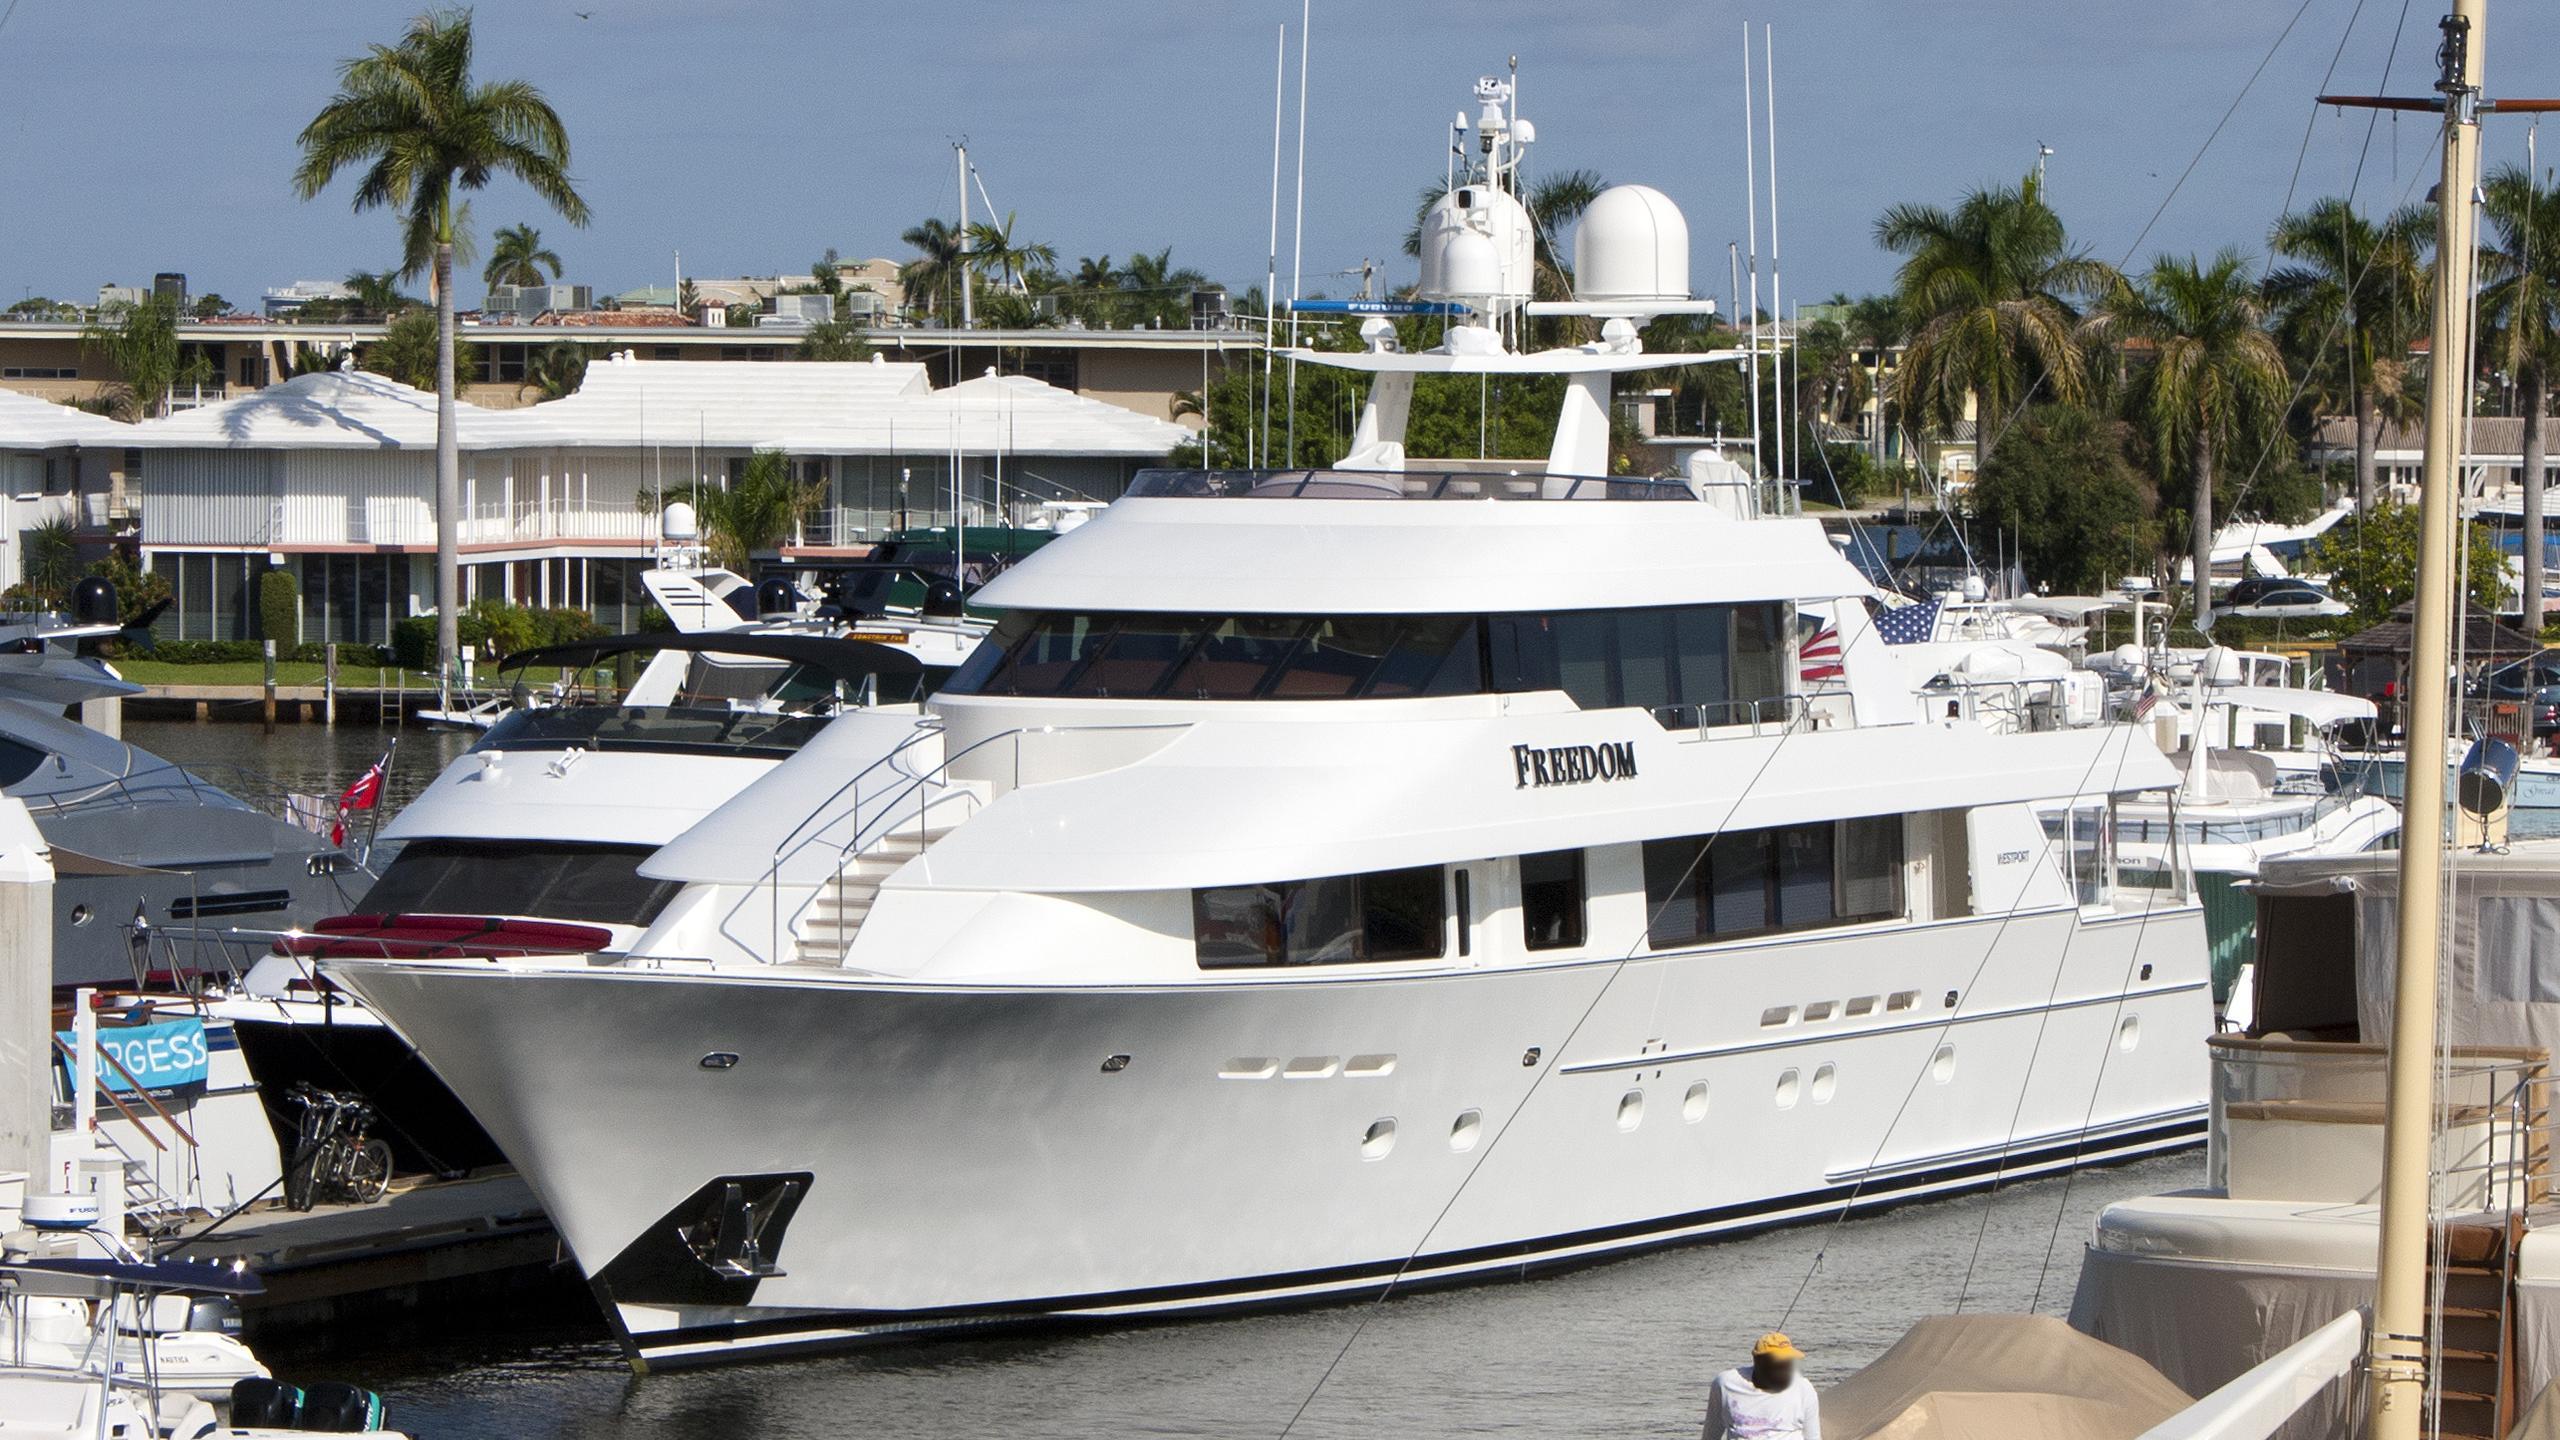 godspeed-motor-yacht-westport-130-2005-40m-half-profile